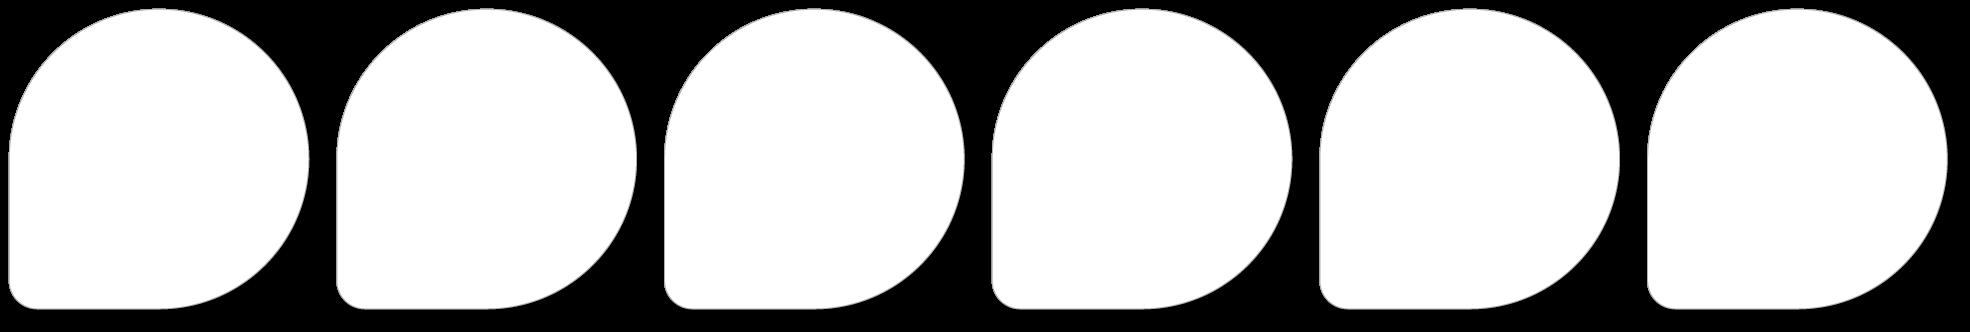 Standard paper film: White